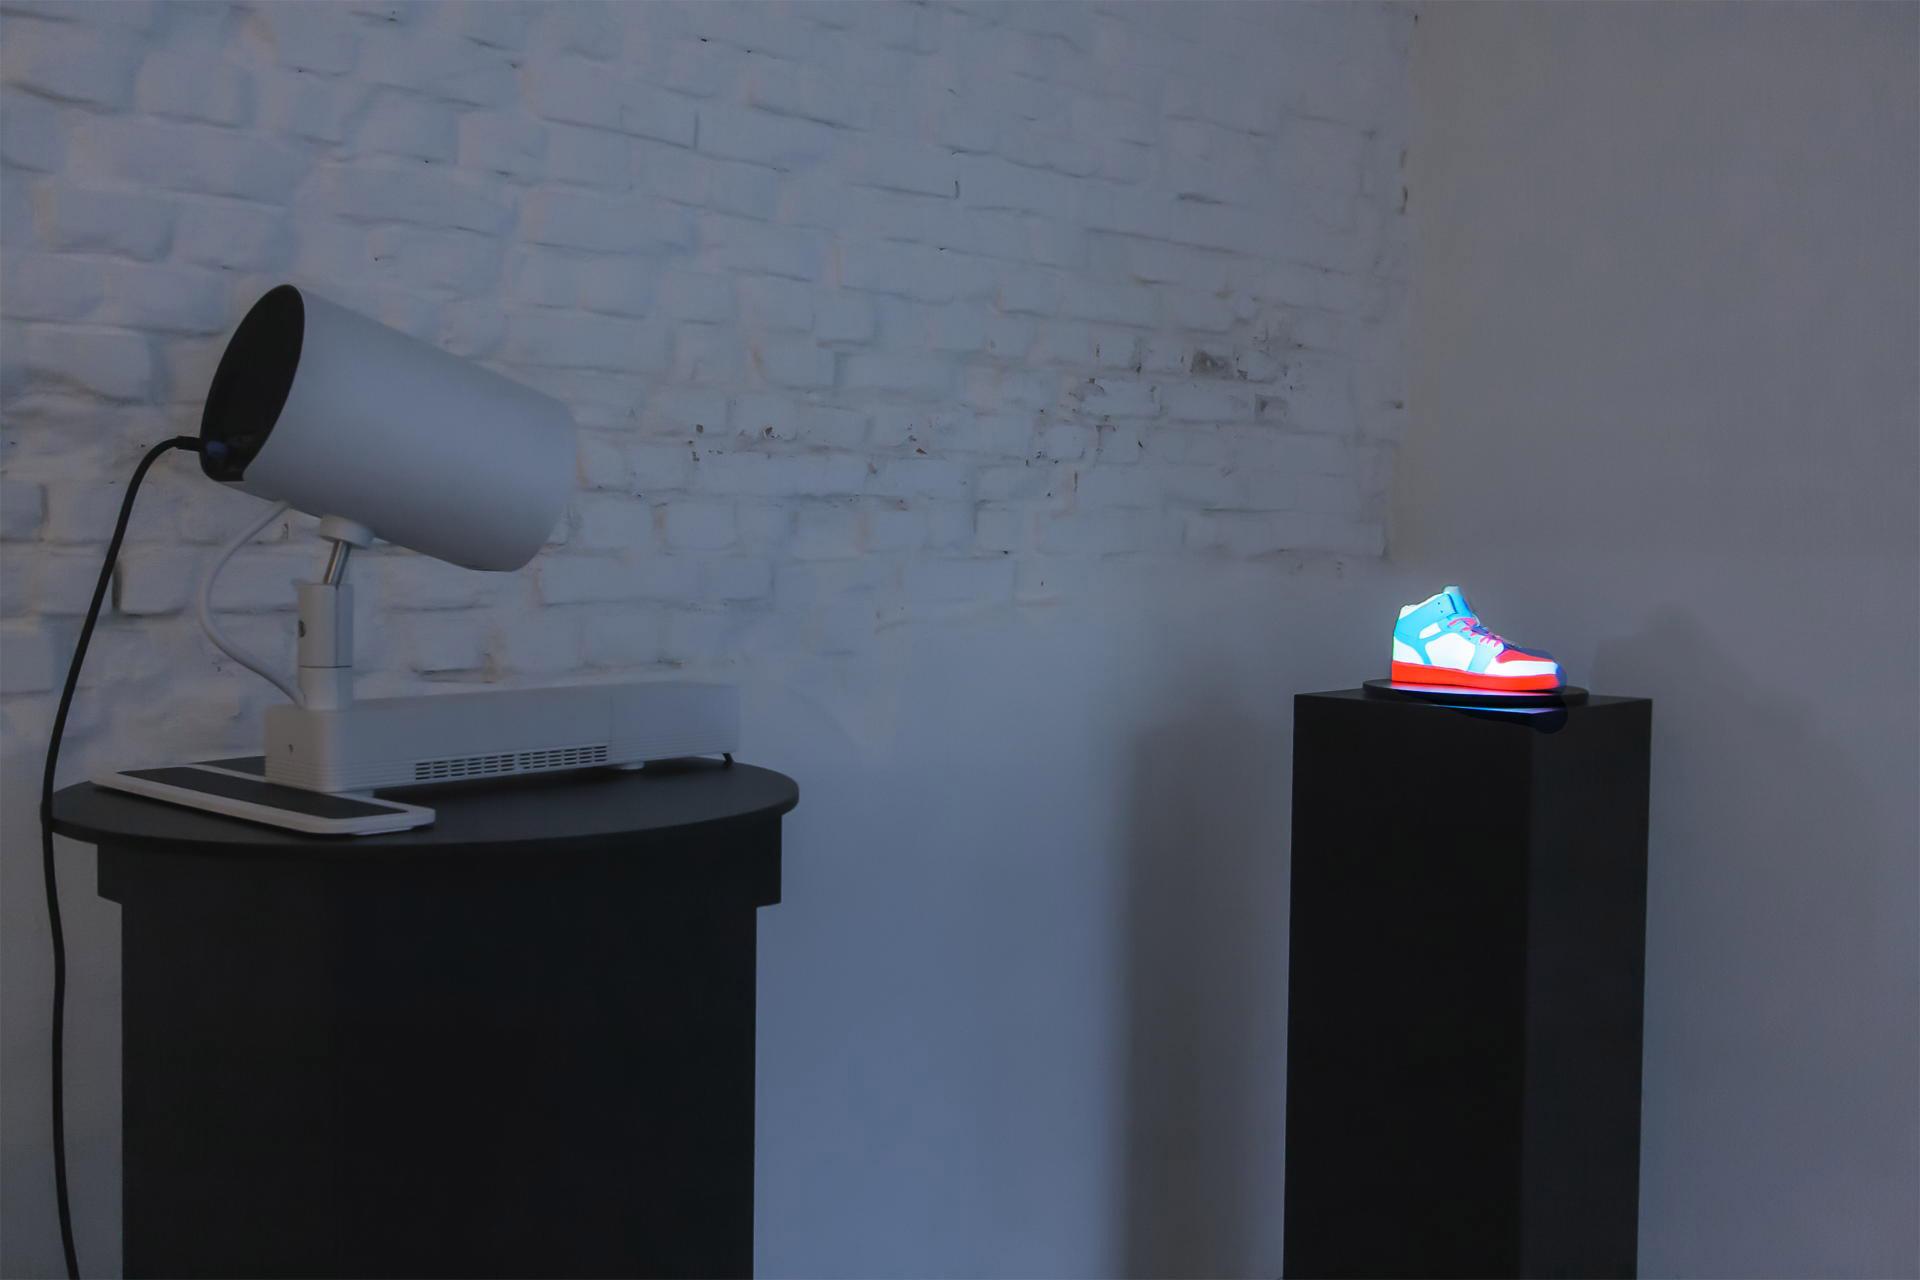 Sneaker_Vase_Projection_pong_li_7